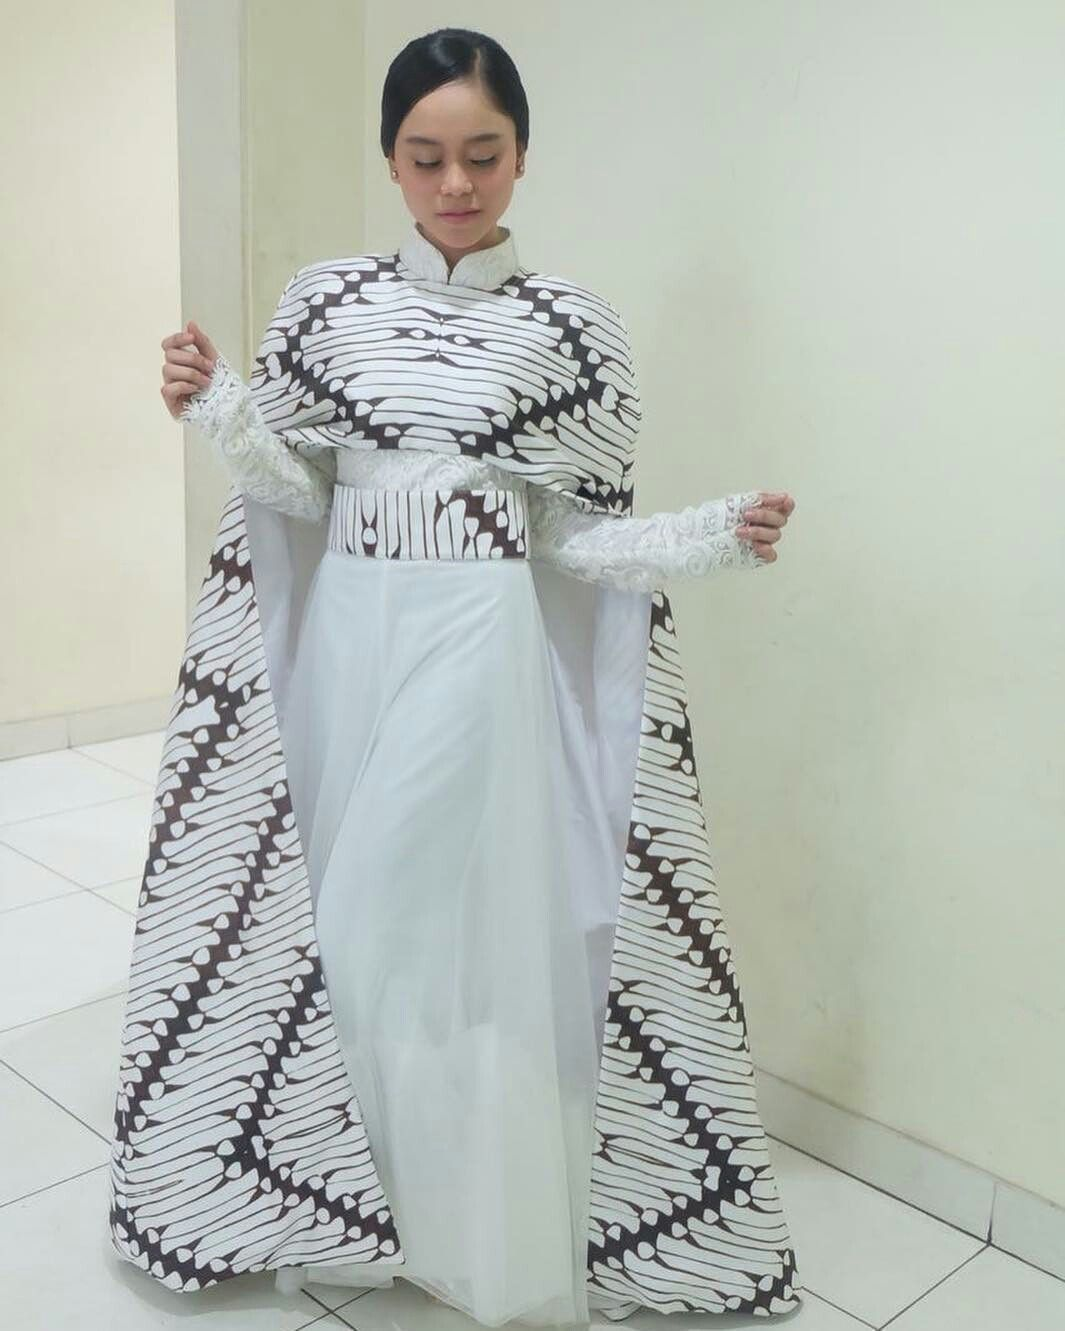 Lesti kejora wearing karya ivan gunawan  Pakaian wanita, Model